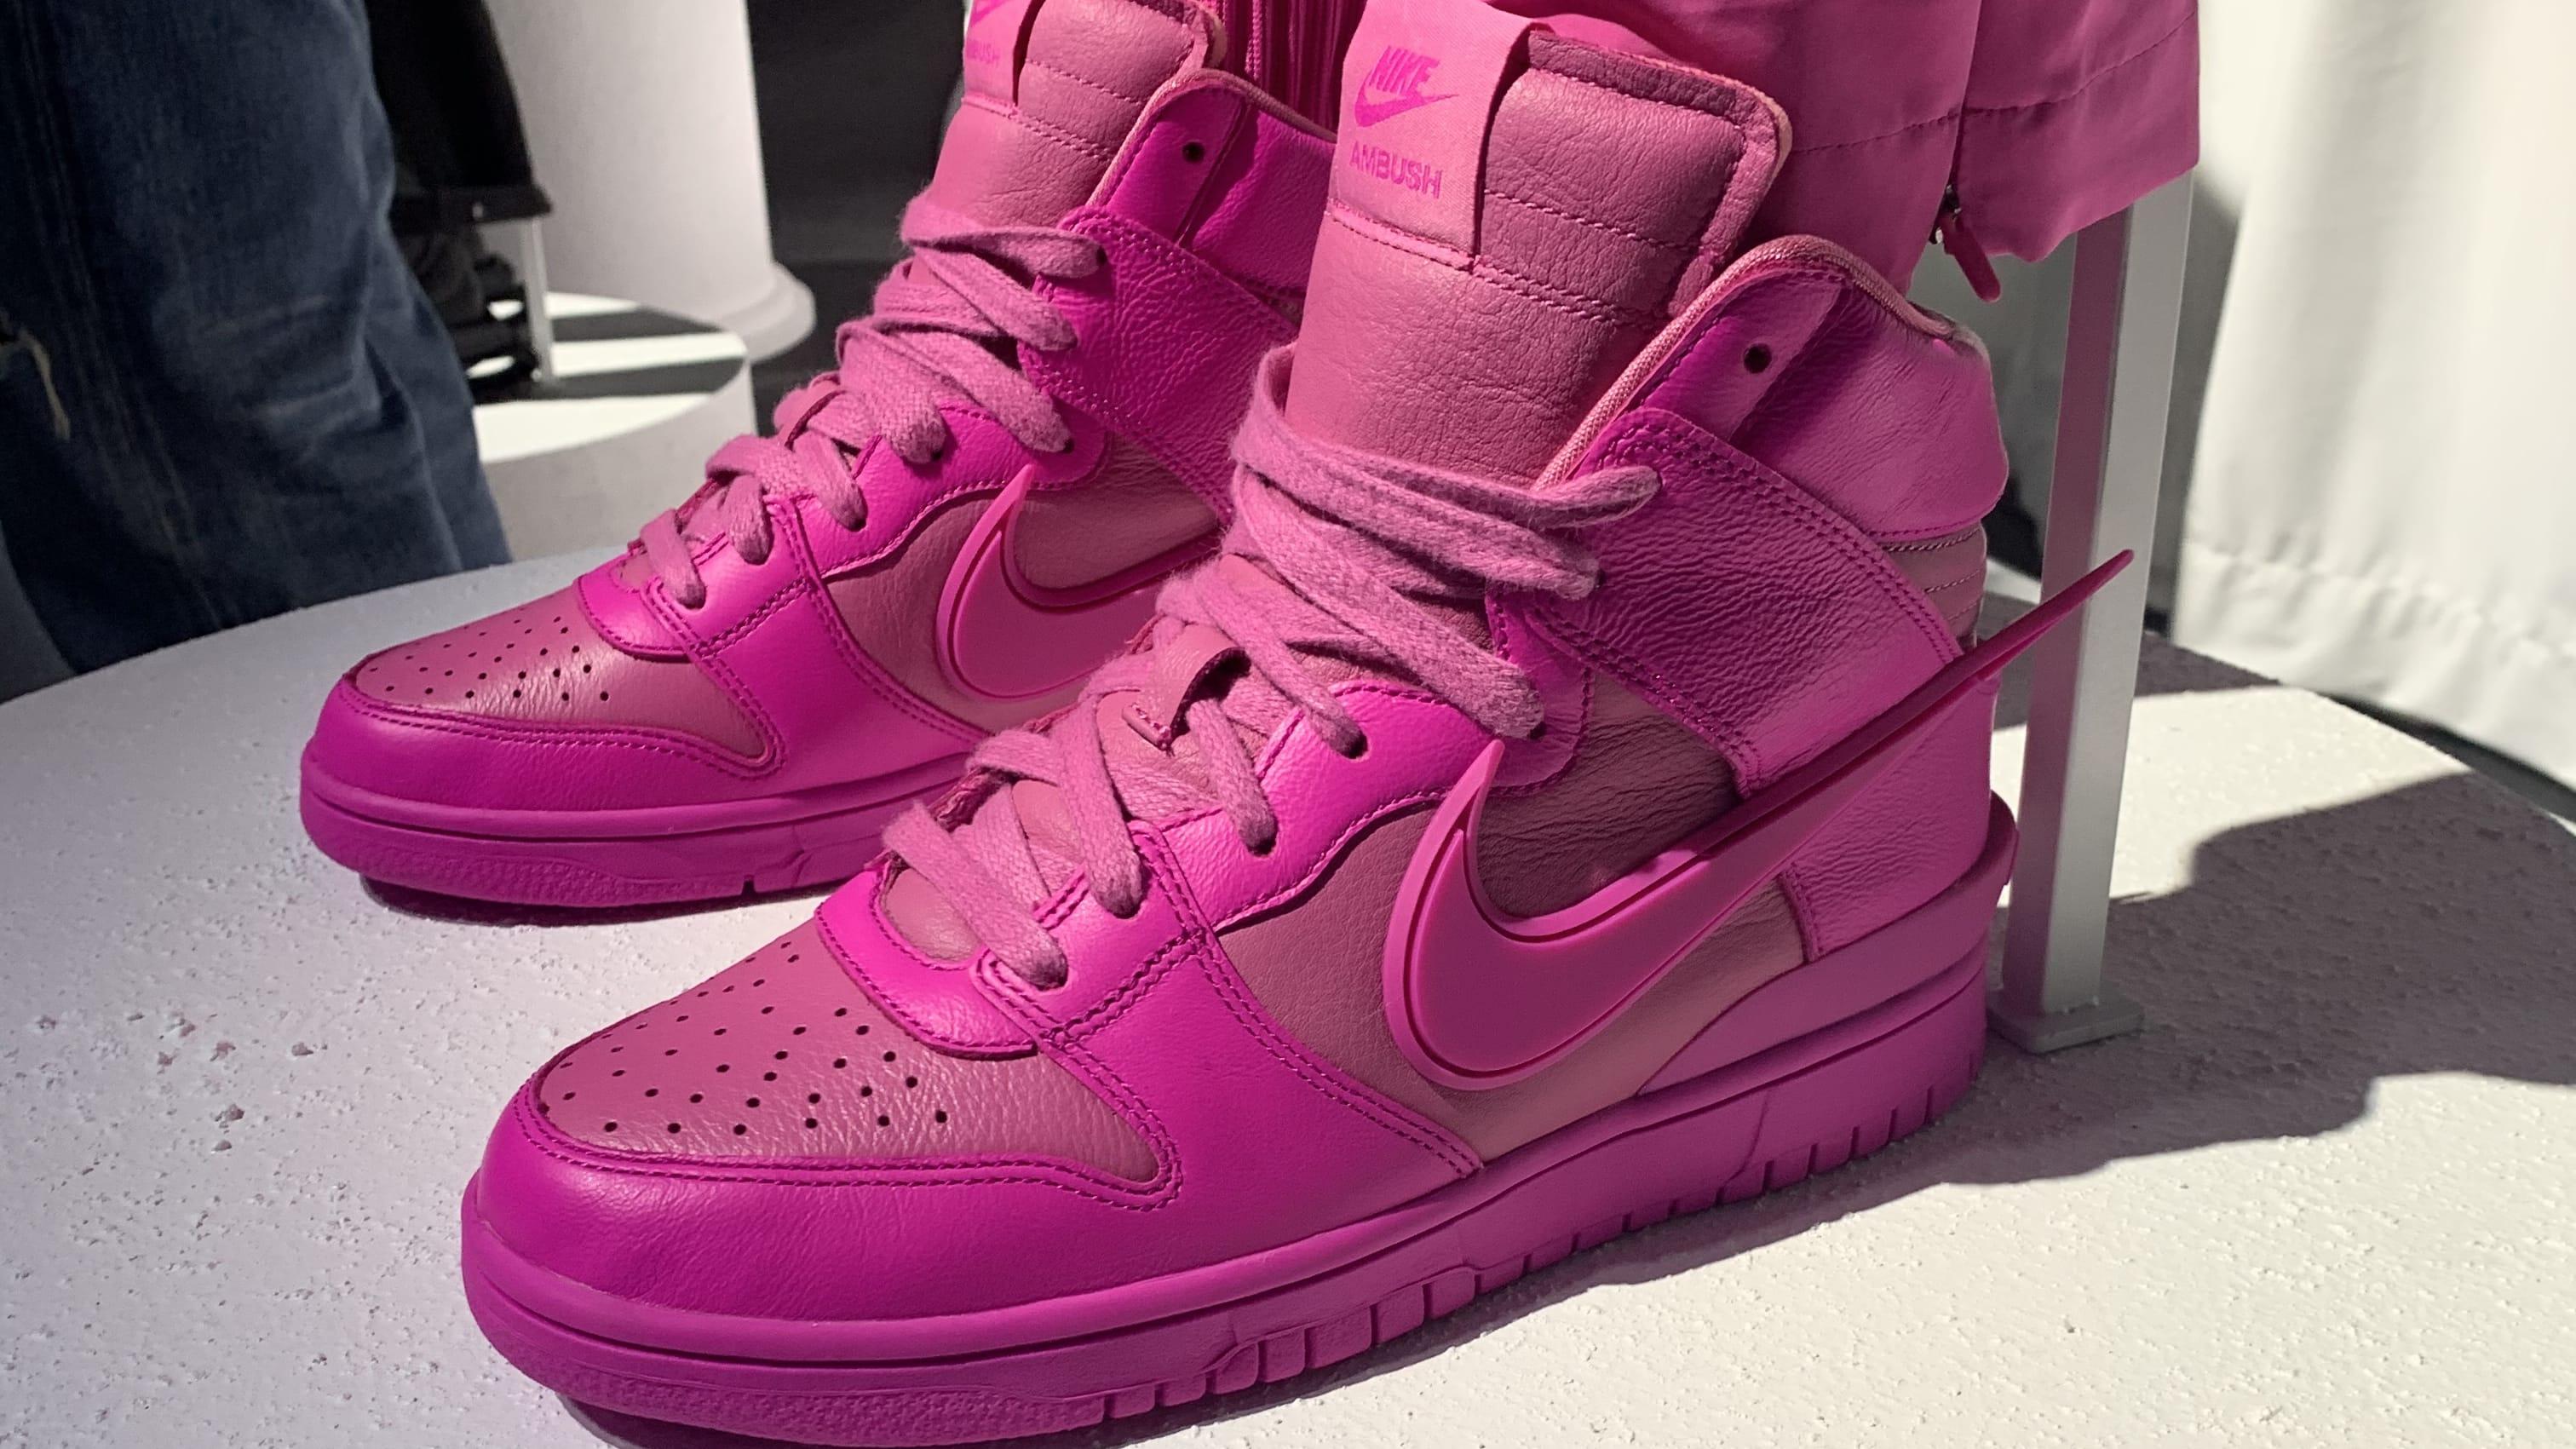 Ambush Nike Dunk High Pink Release Date